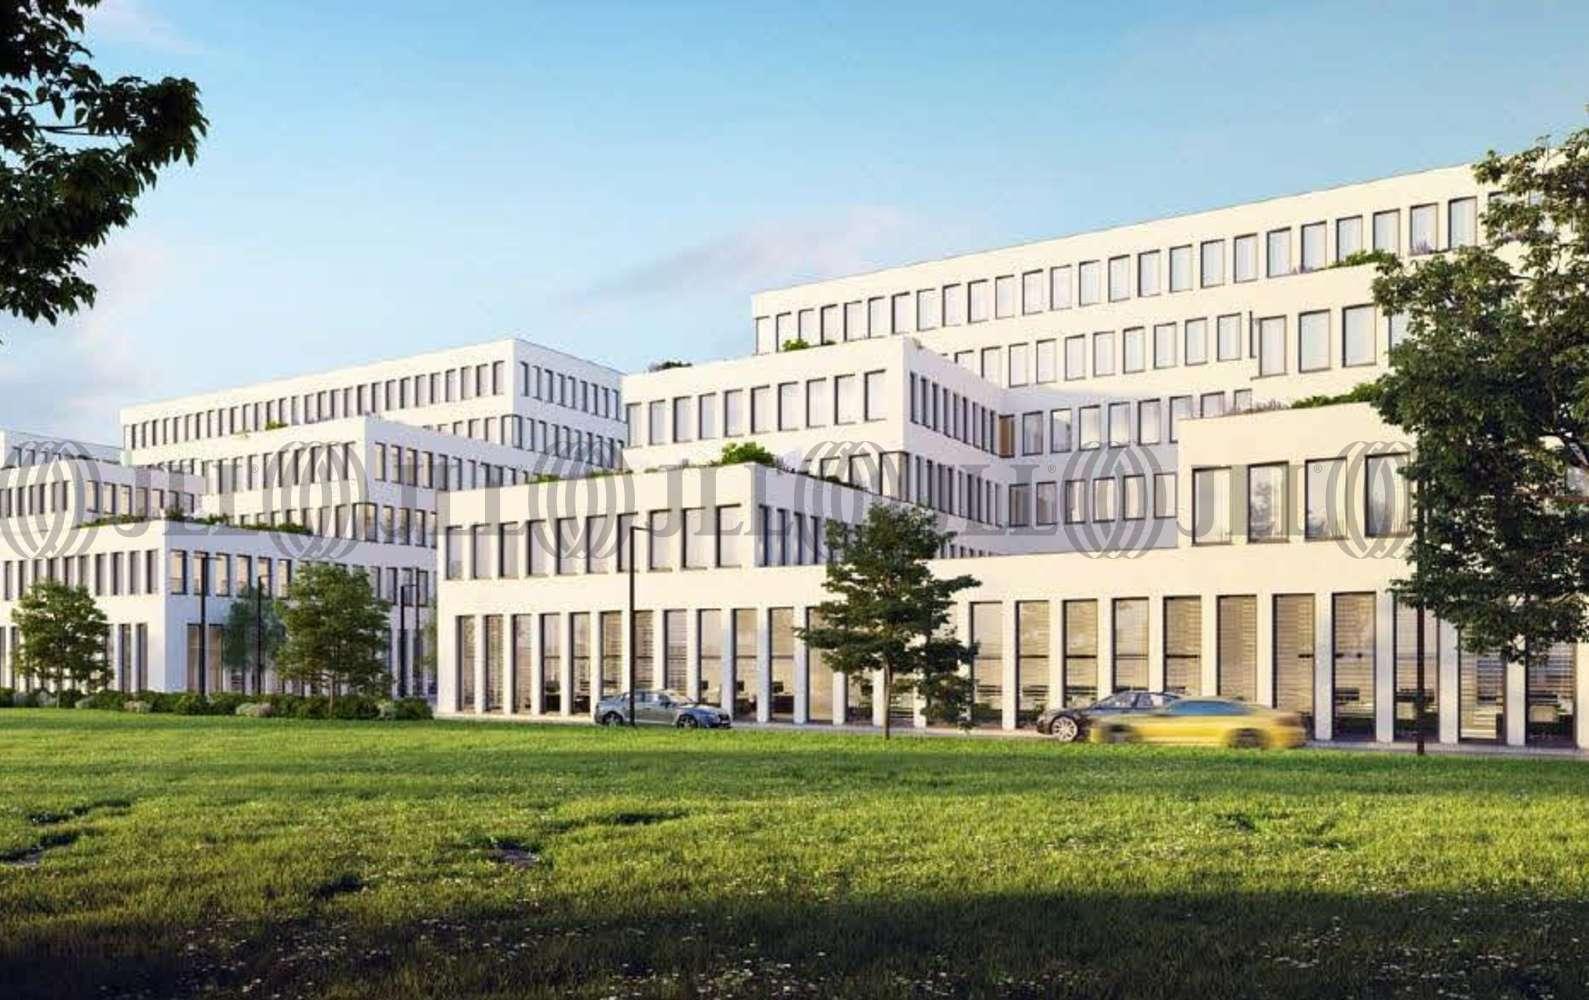 Büros Raunheim, 65479 - Büro - Raunheim - F2219 - 10543508